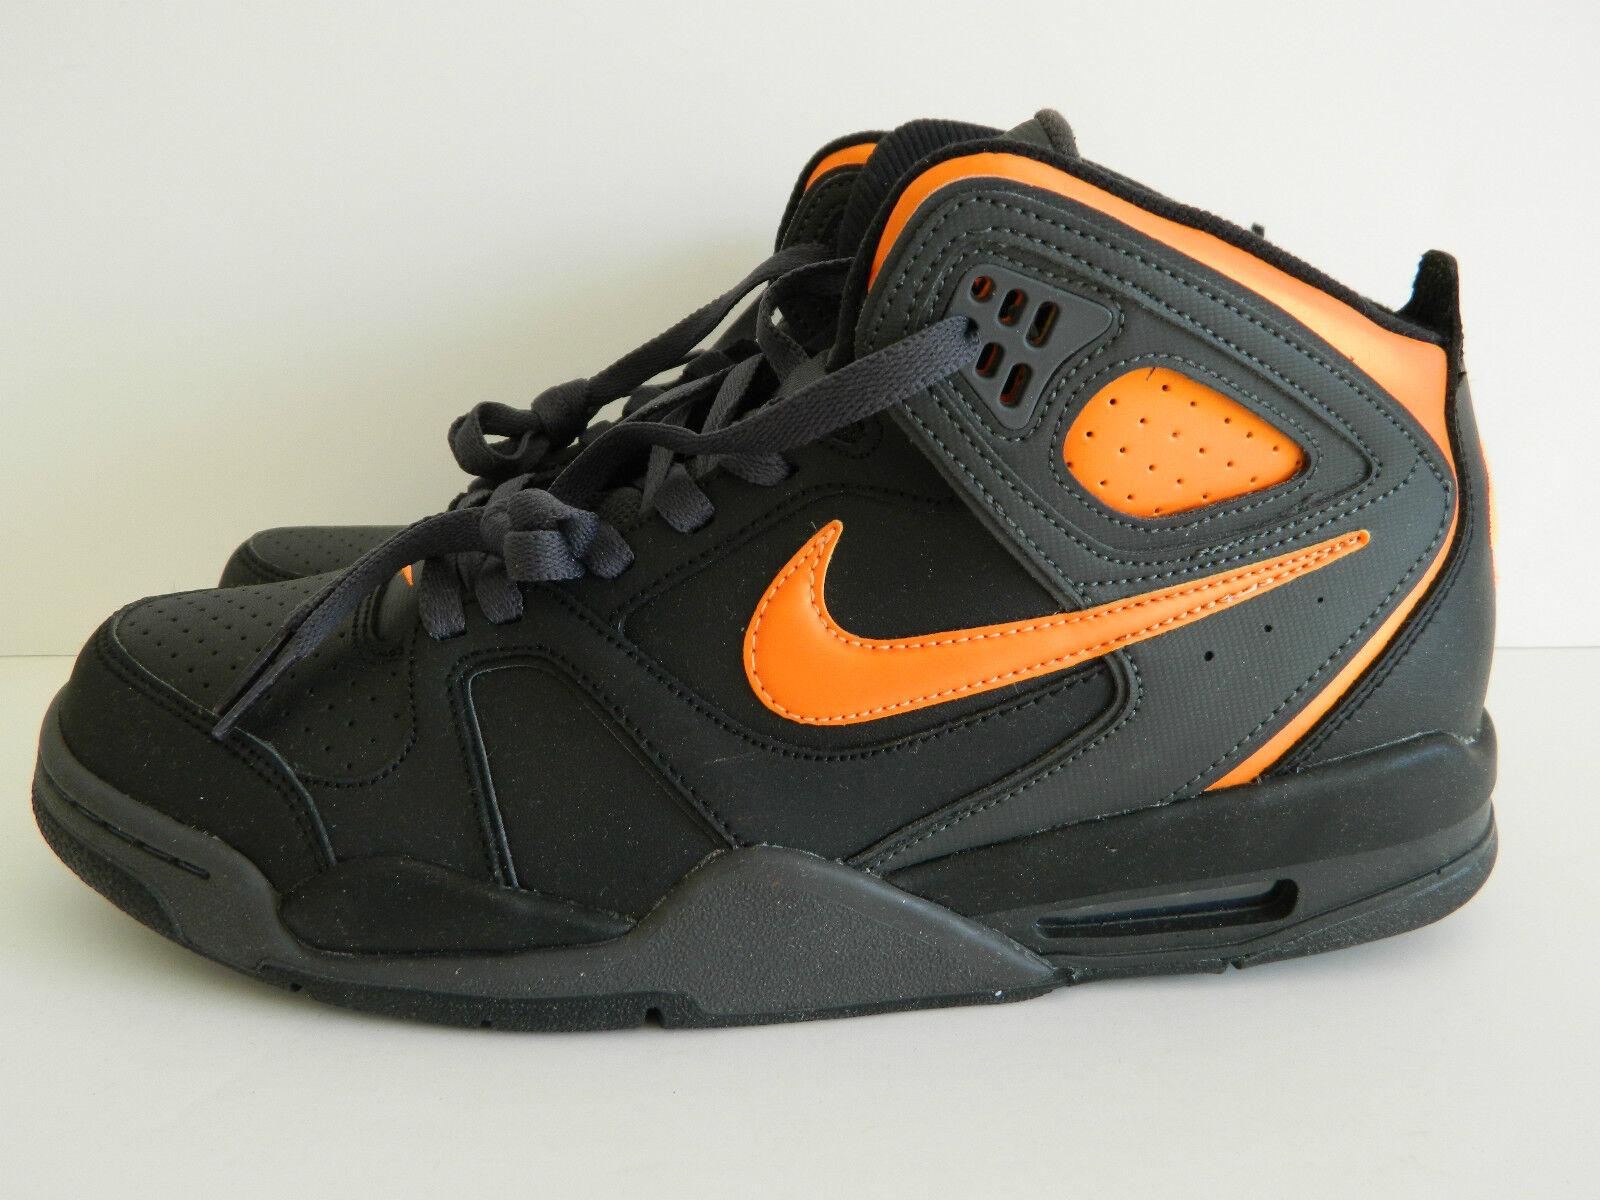 Nike Air Flight Falcon ( Black and Bright Citrus ) ( 397204 080 )